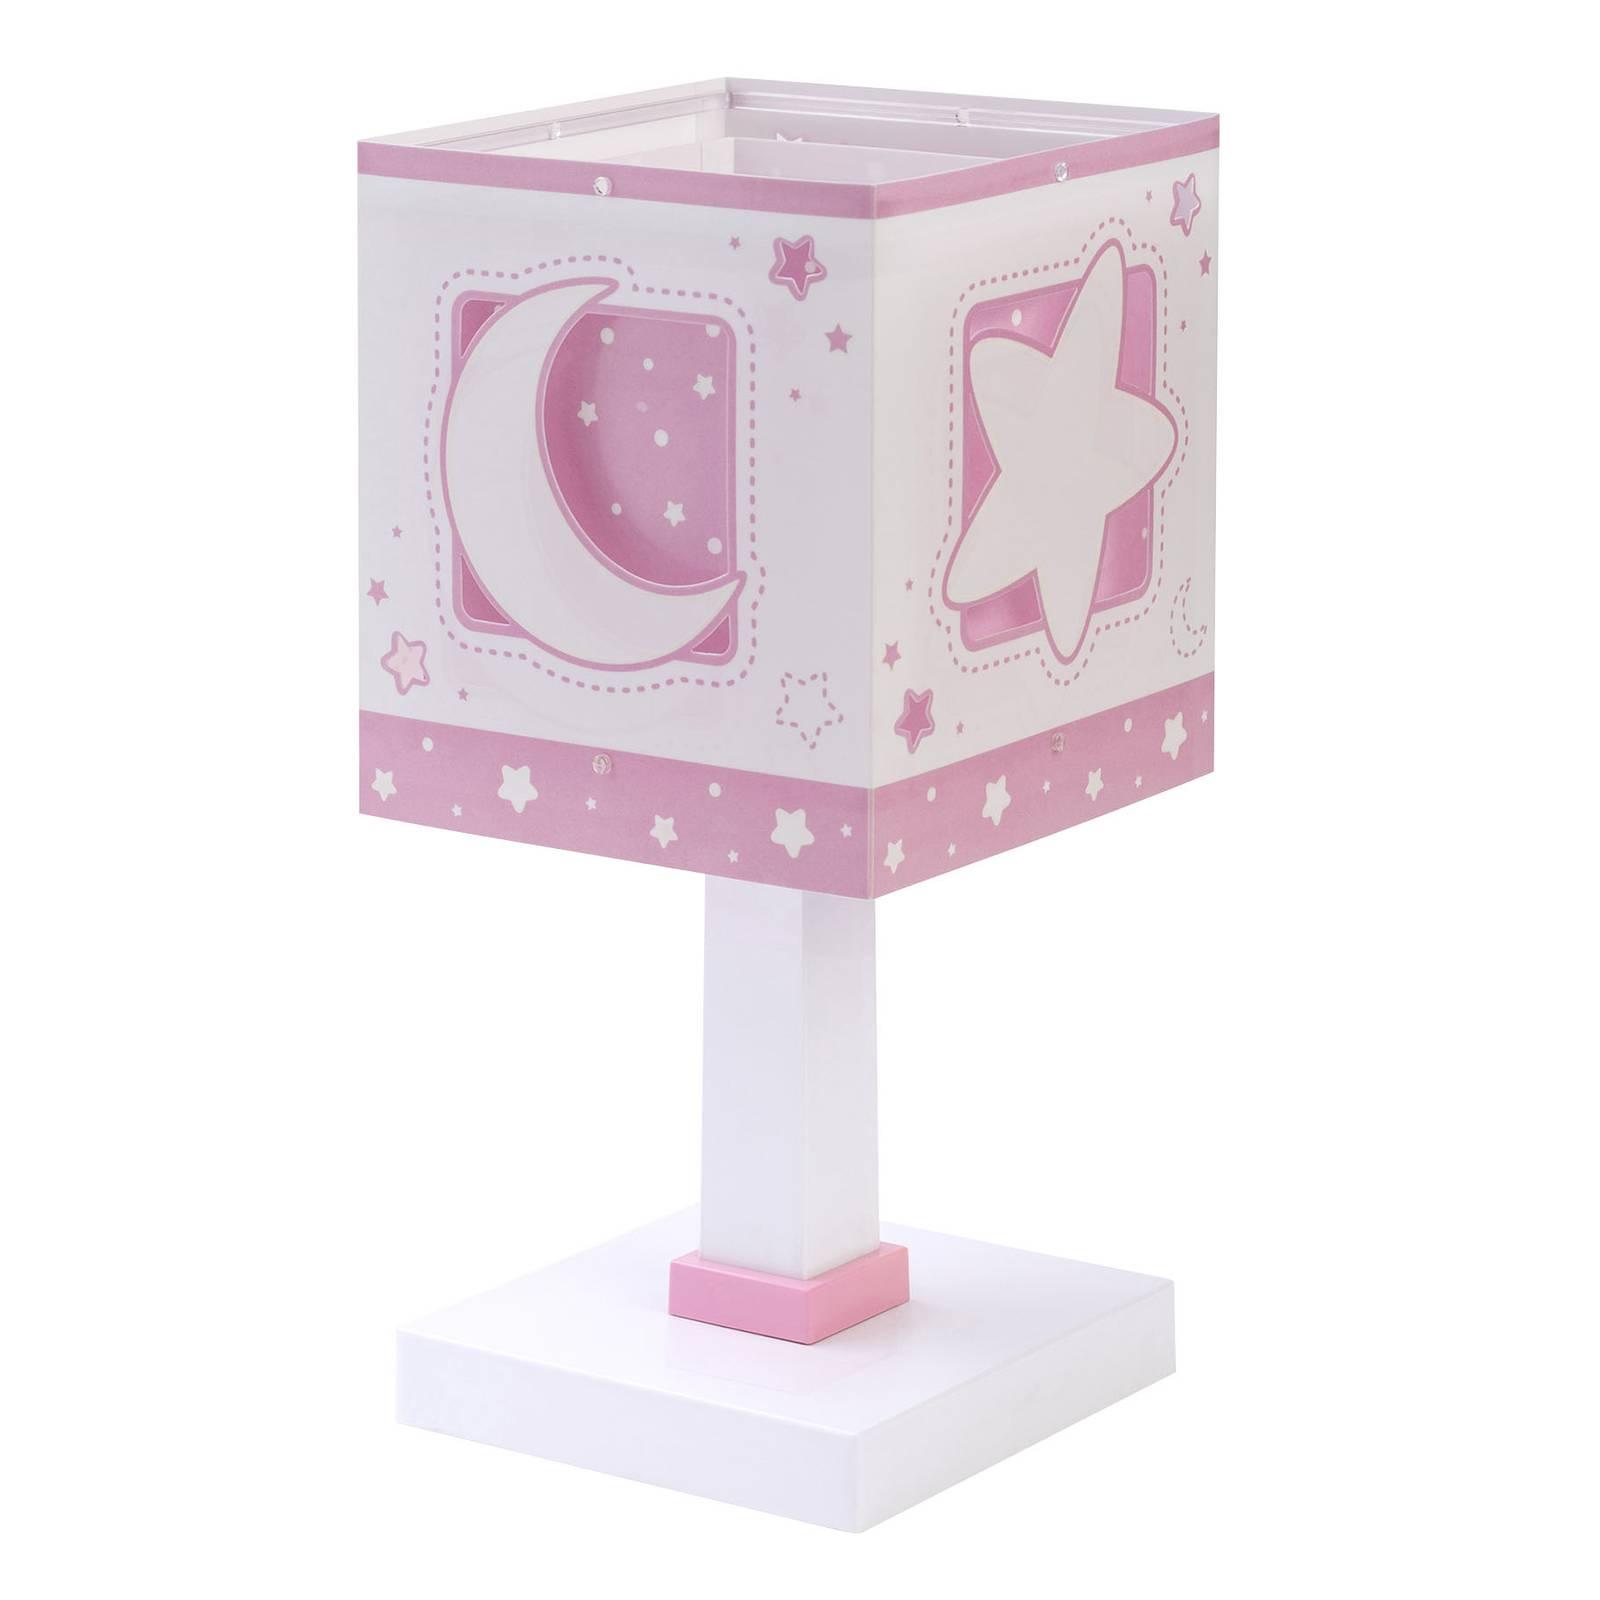 Lastenhuoneen pöytälamppu Moonlight, roosa